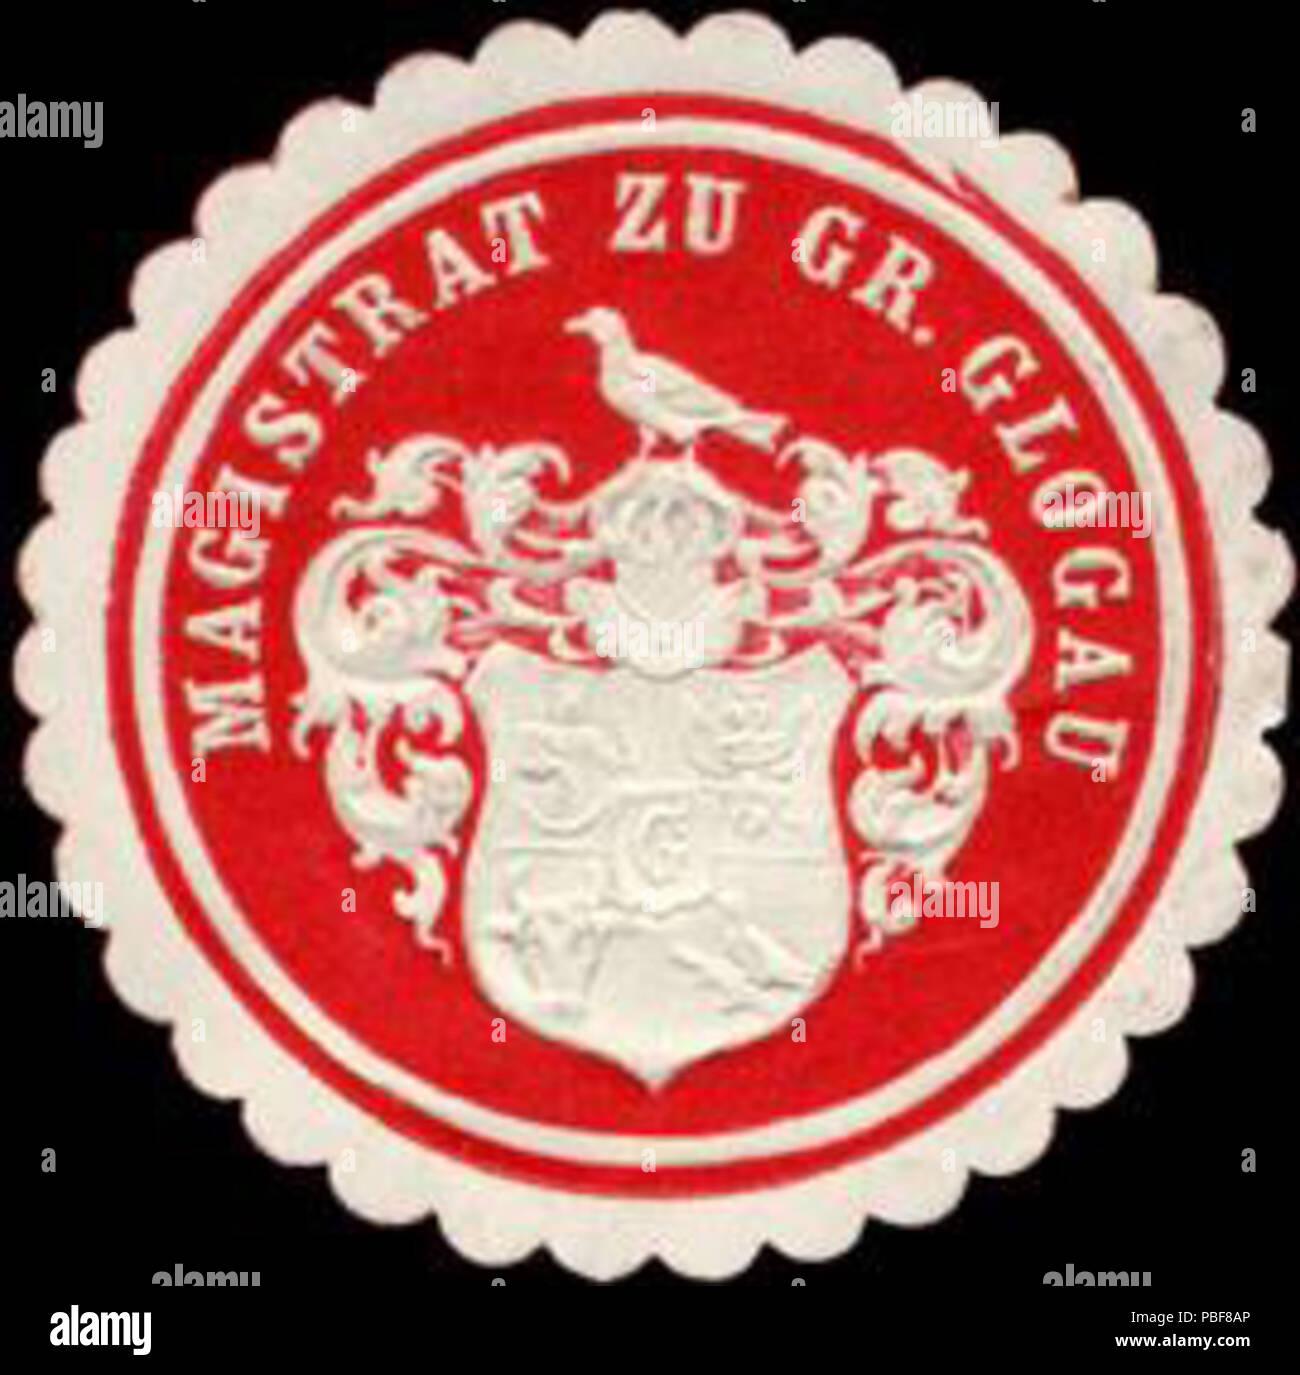 1488 Siegelmarke Magistrat zu Gross Glogau W0226505